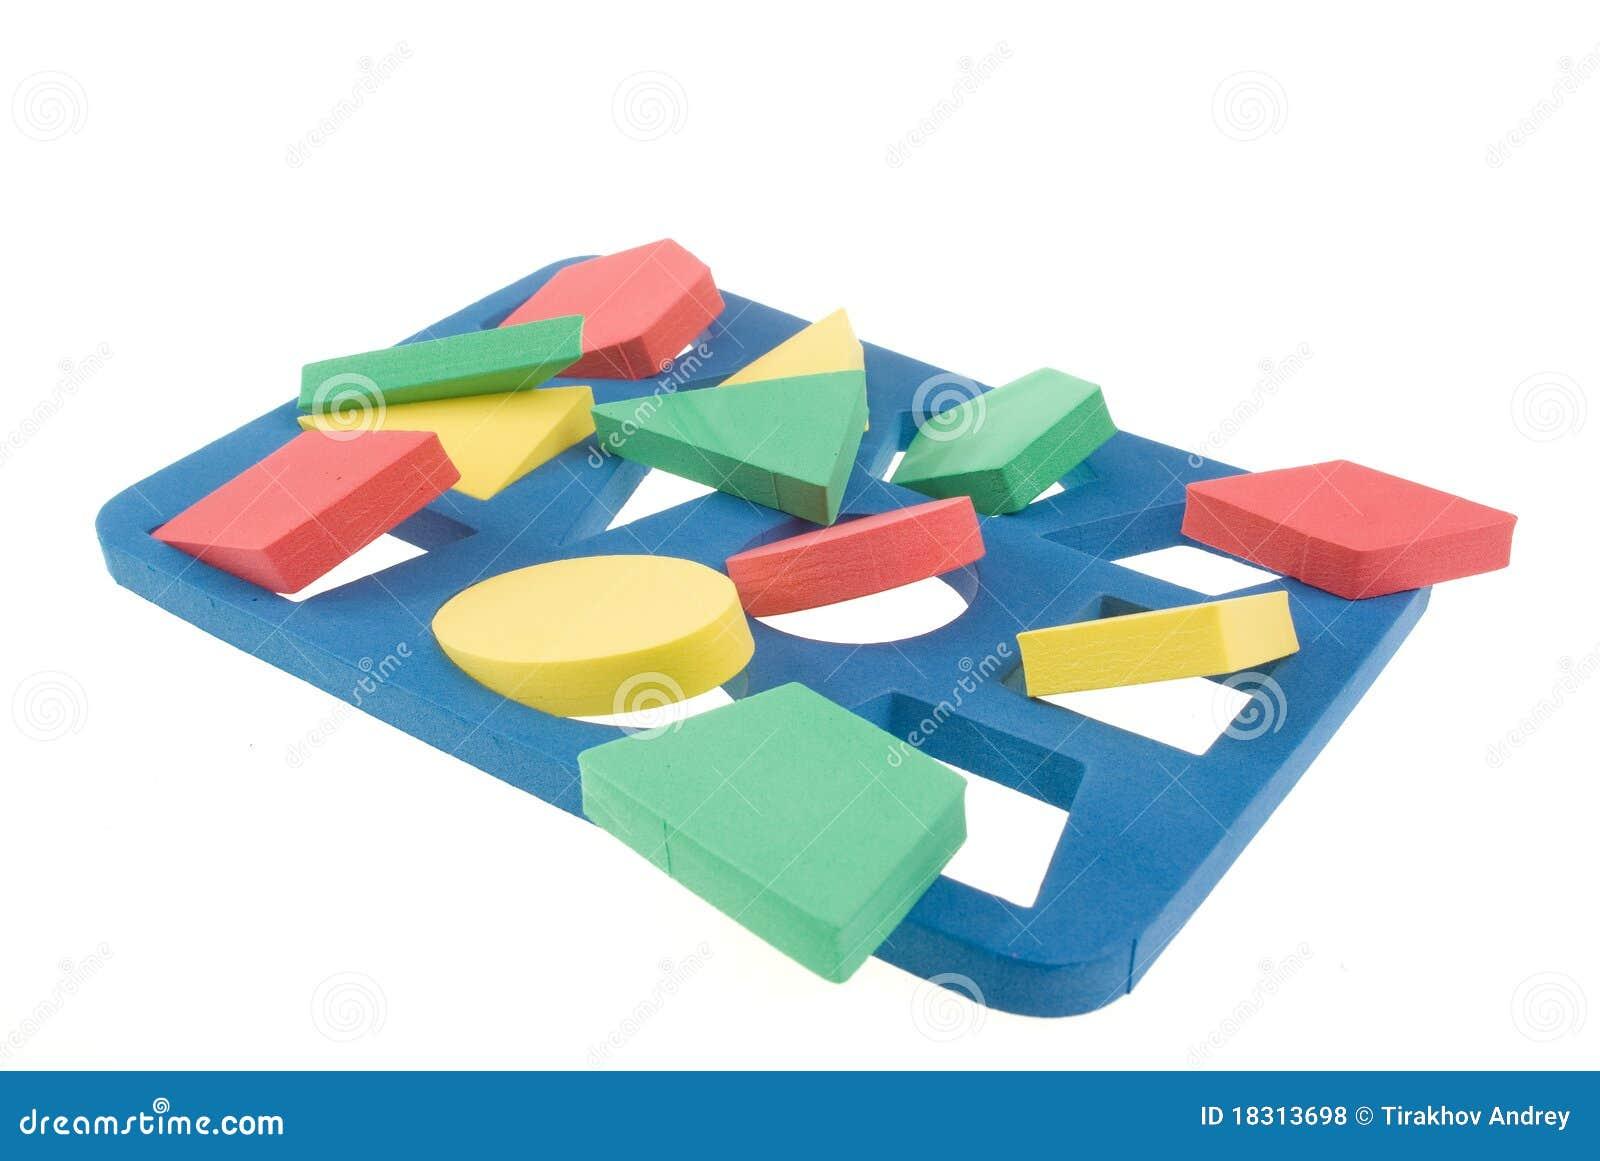 Eccezionale Giochi Figure Geometriche ZE41 » Regardsdefemmes EO18